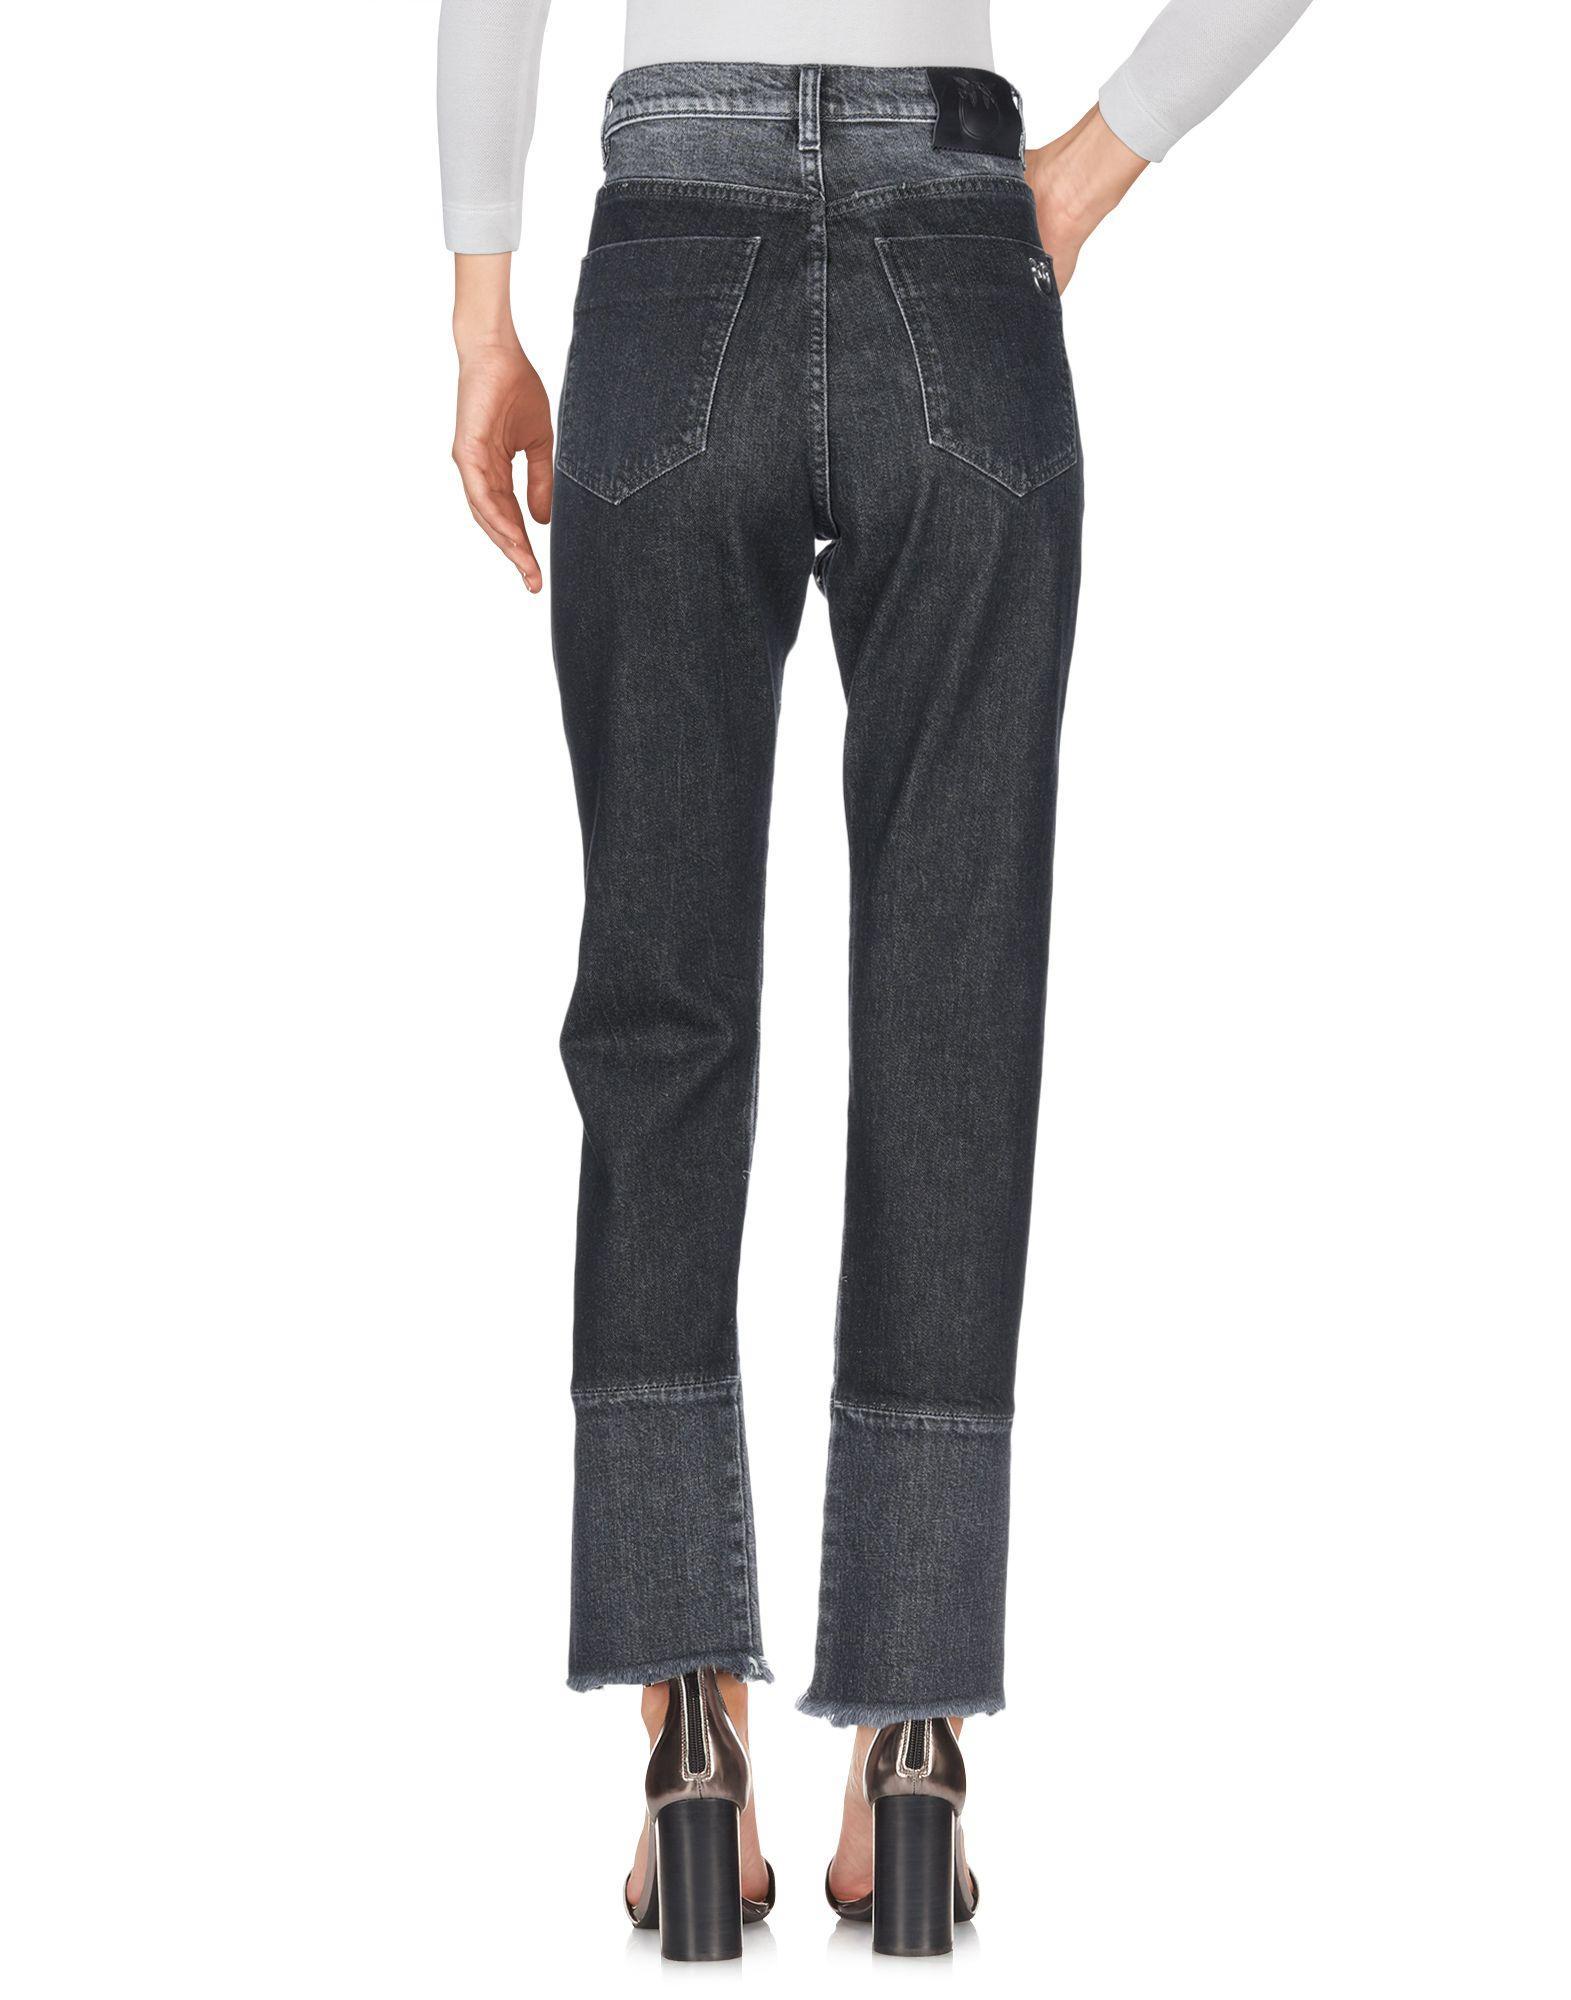 Pantalones vaqueros Pinko de Denim de color Negro